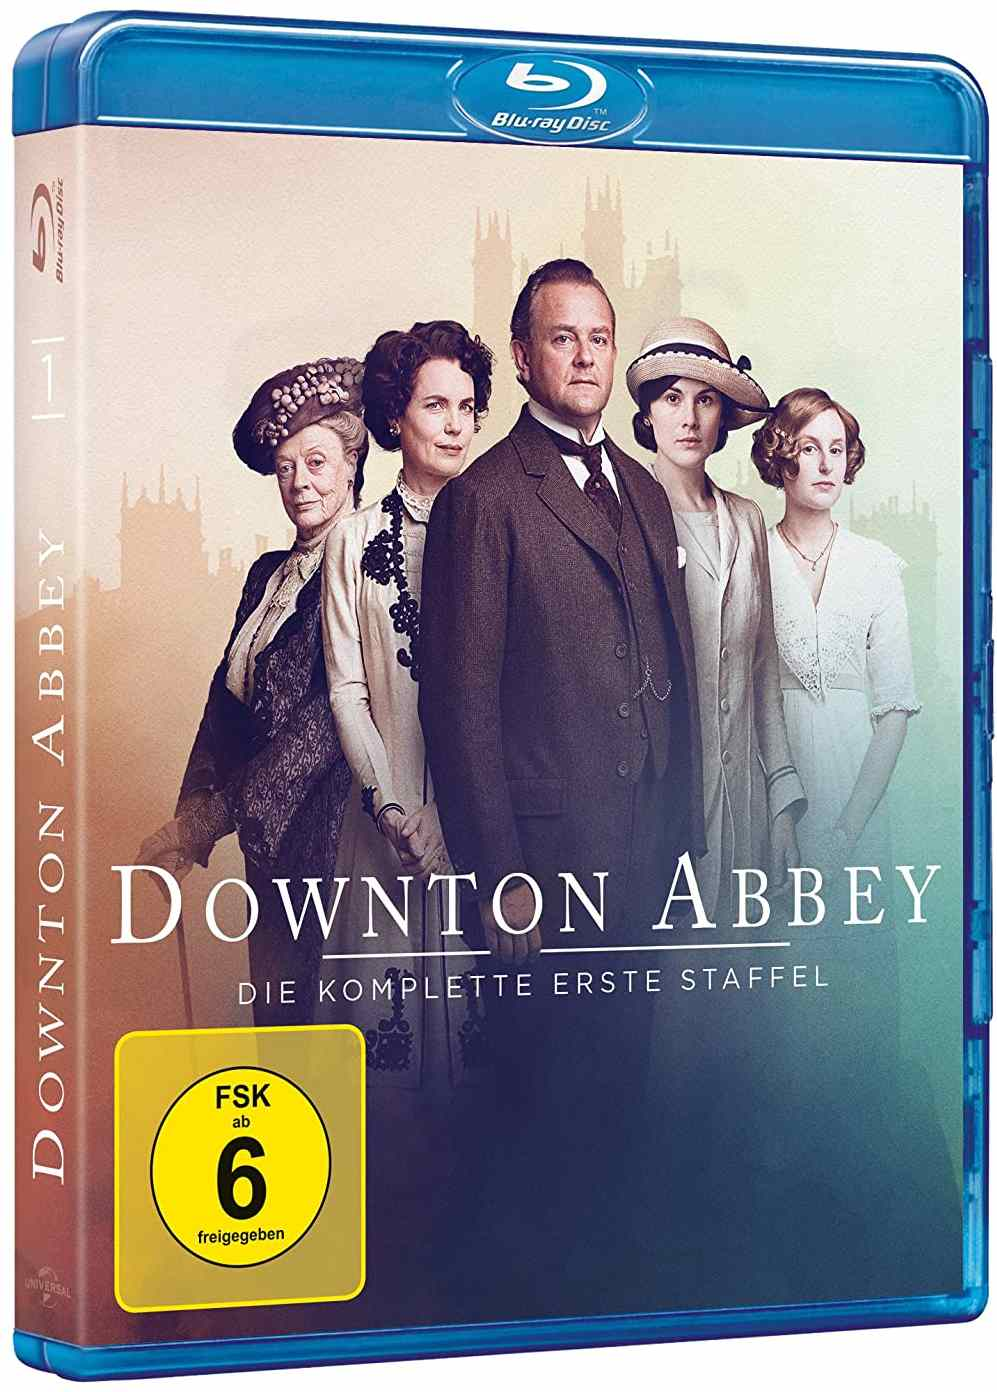 PANSTVÍ DOWNTON 1+2 (6 BD) - Blu-ray